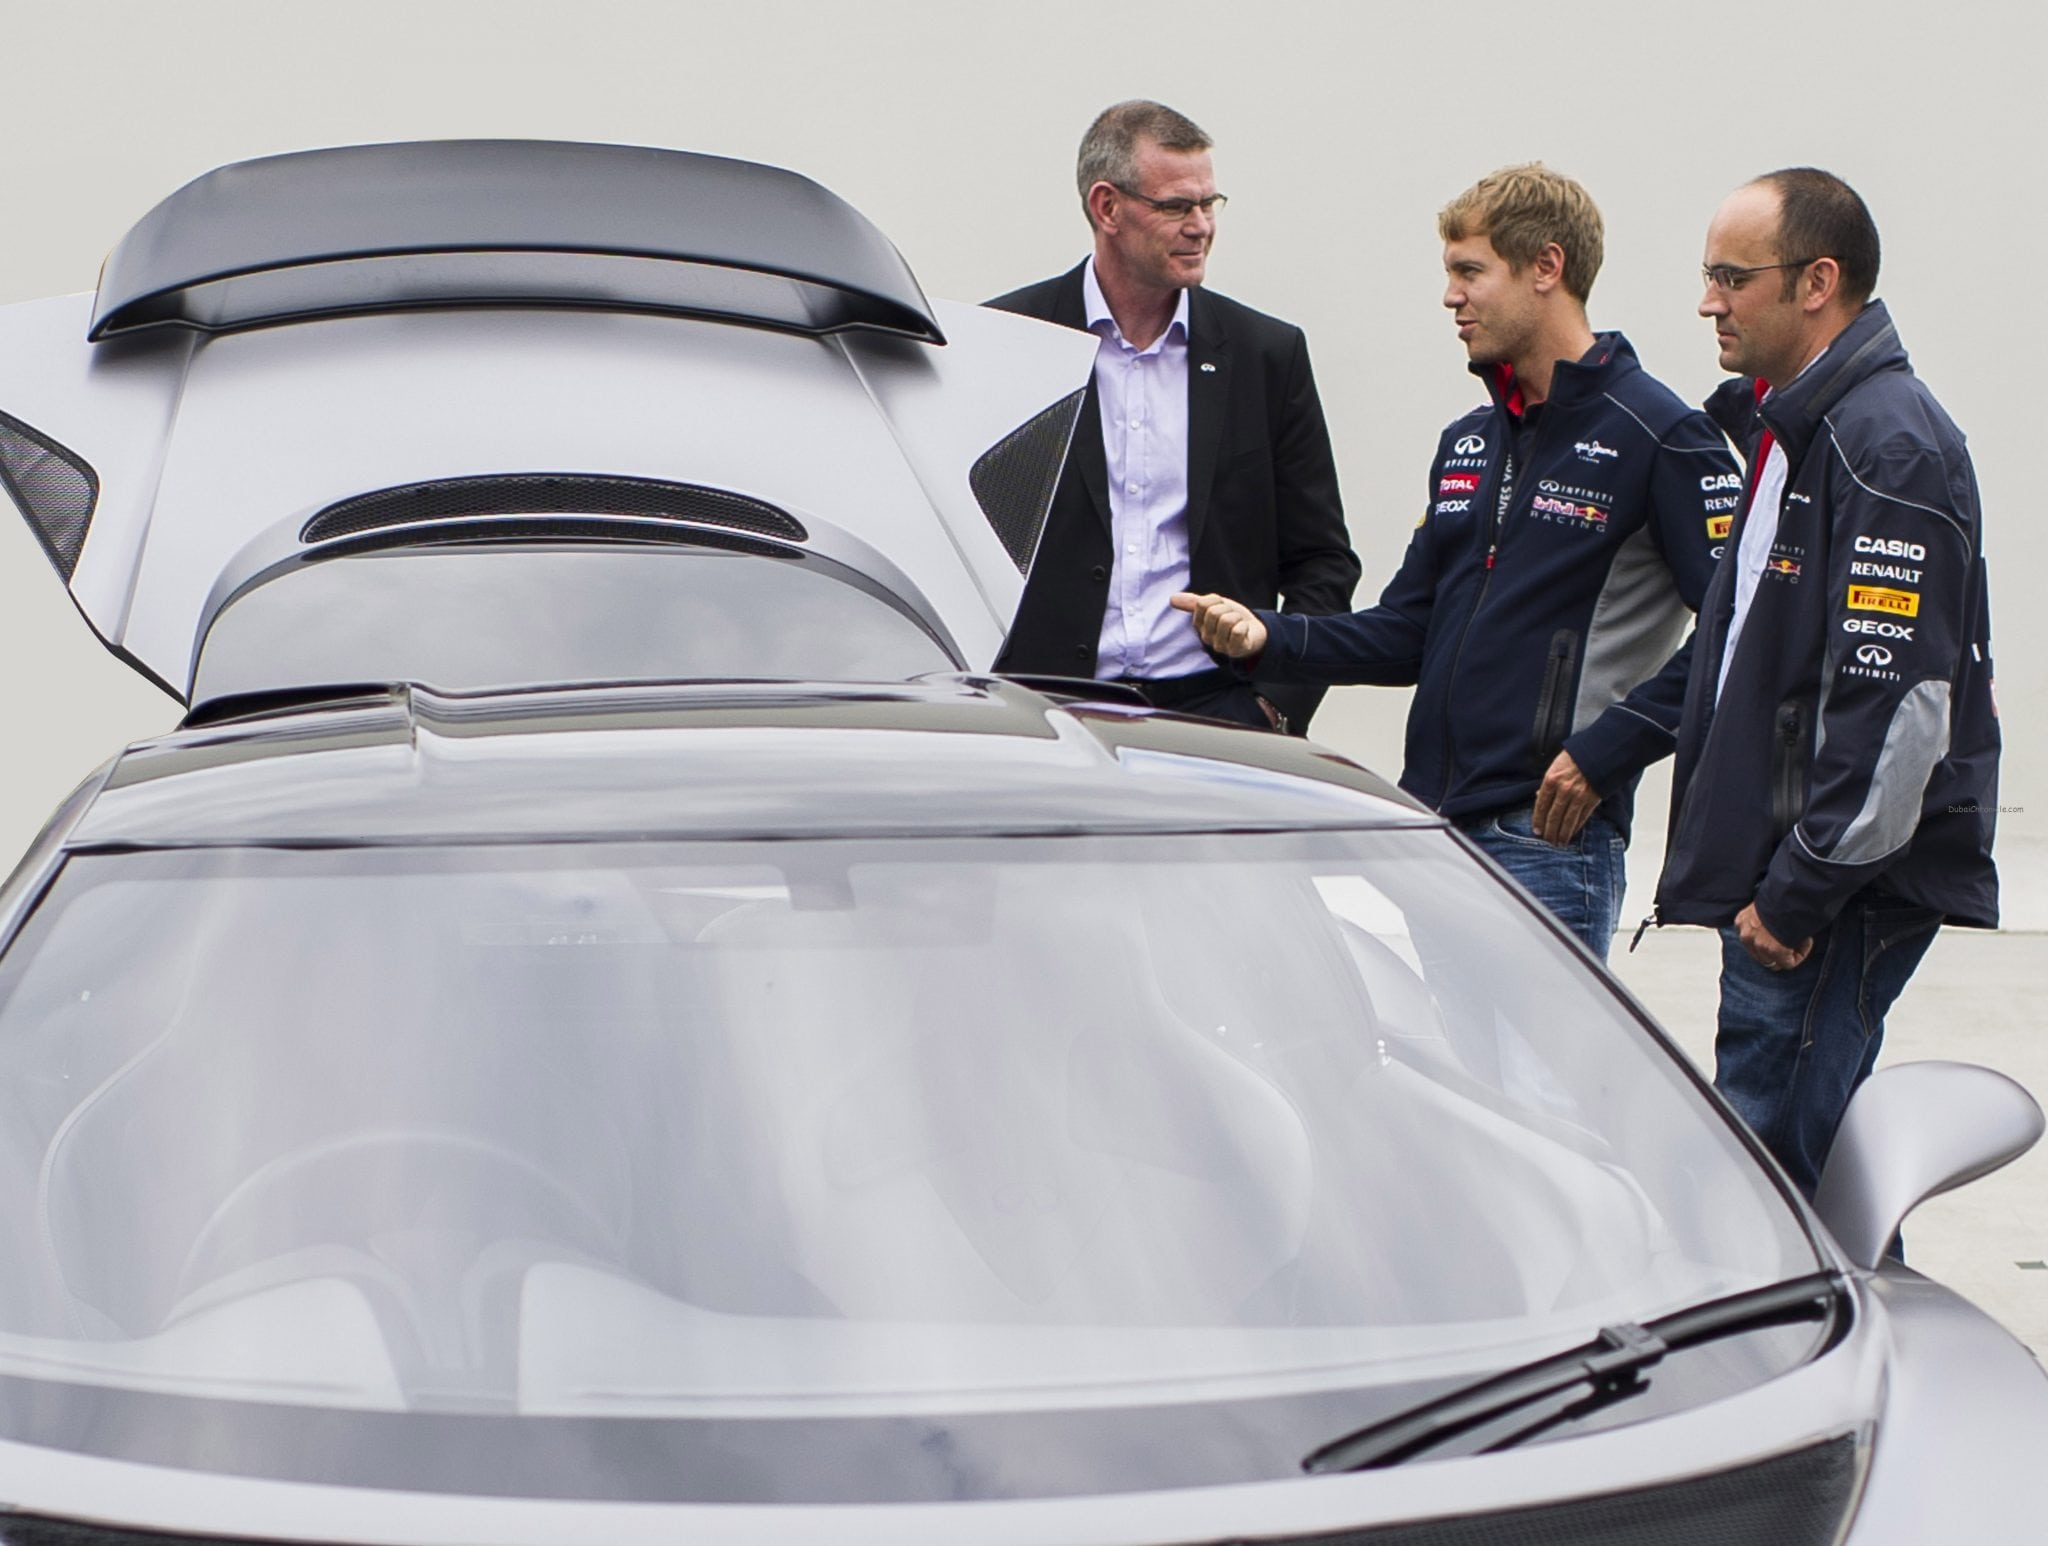 Sebastian Vettel explores the future of Formula One and road car technology ahead of British Grand Prix 2013